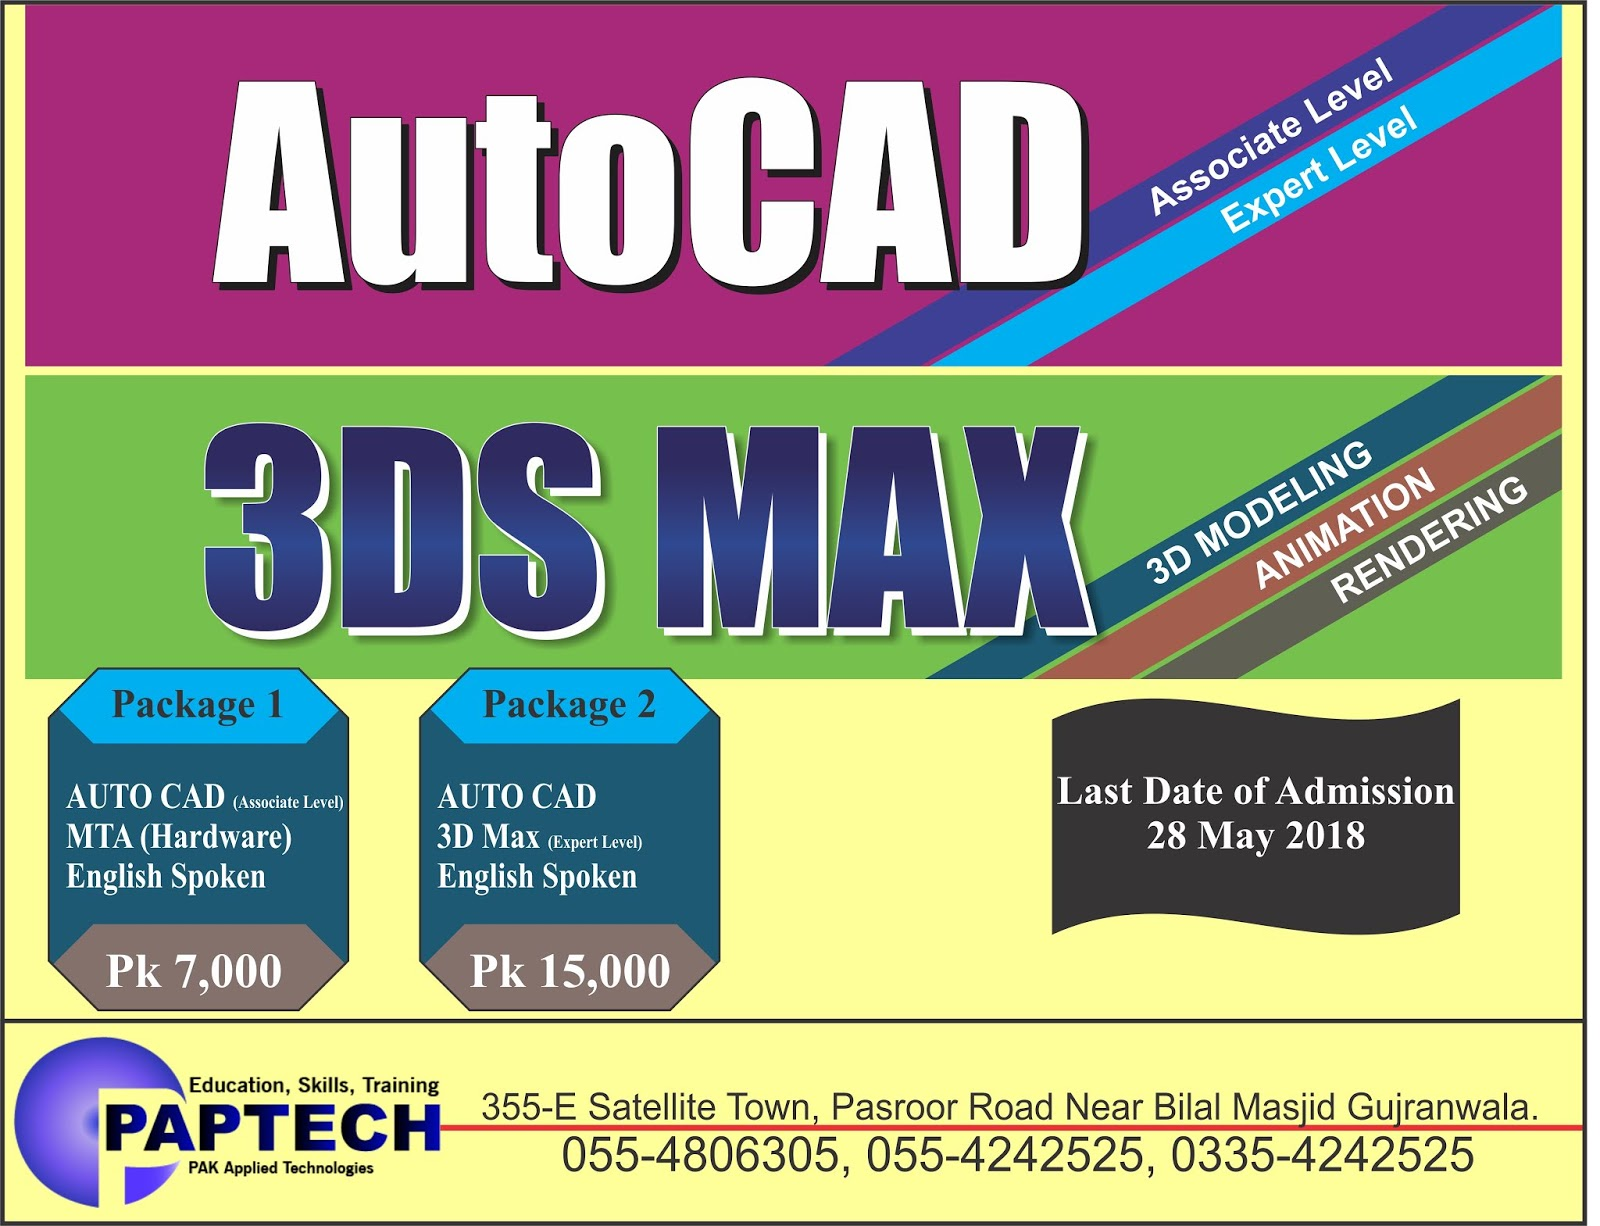 AUTOCAD 3DS MAX Admission Open